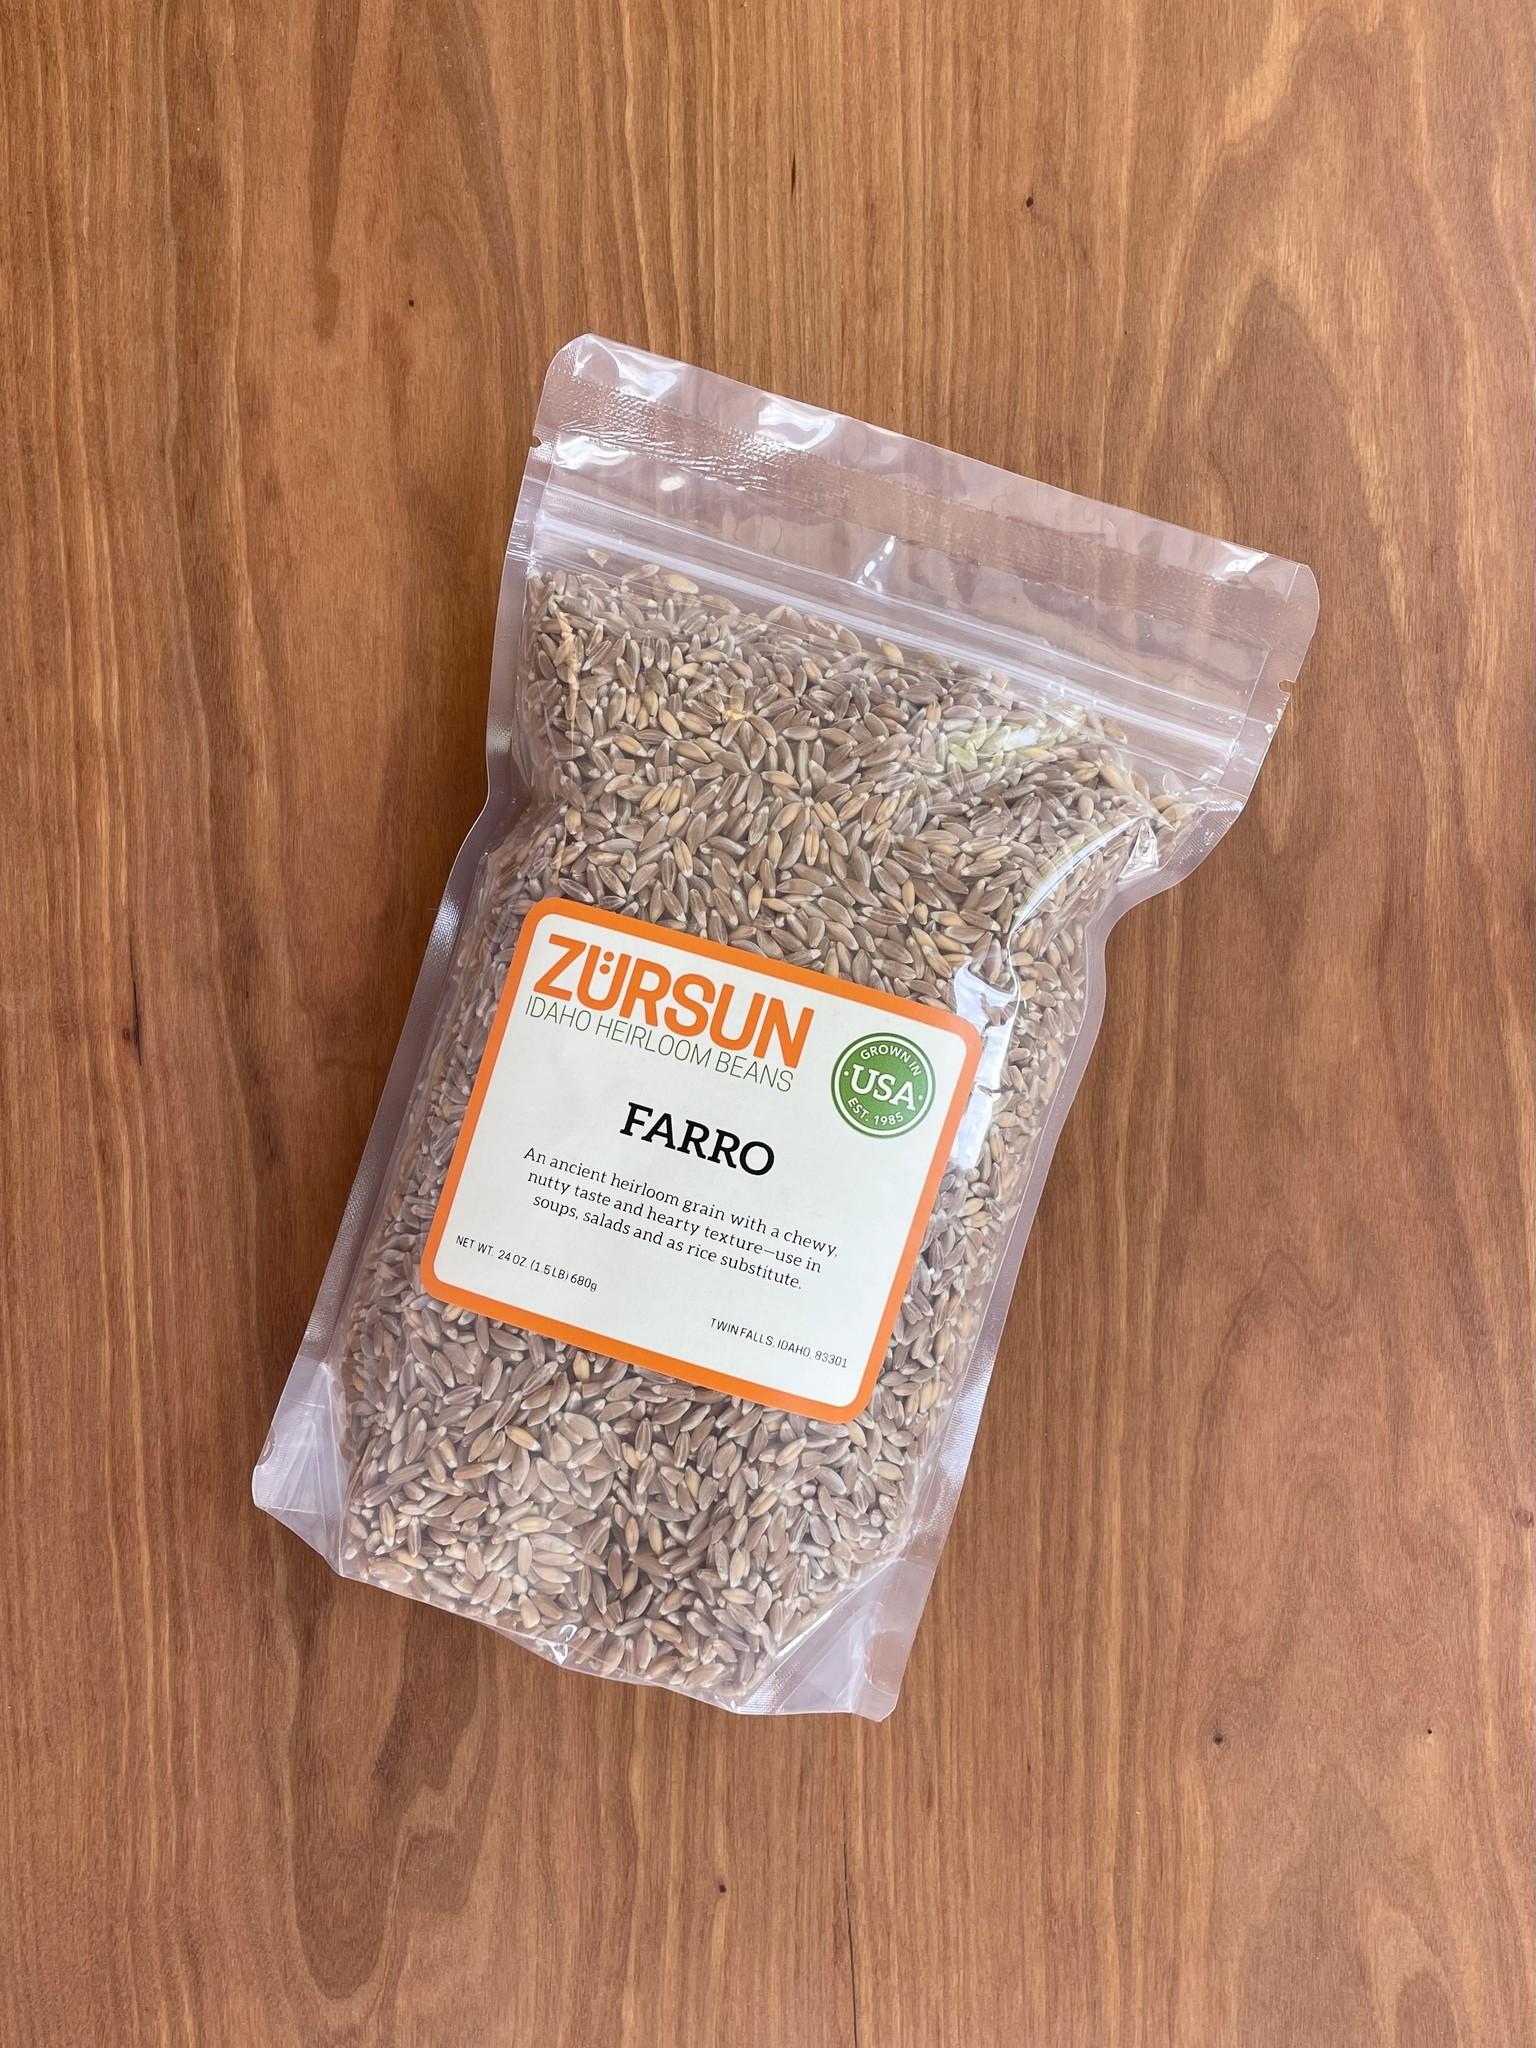 Zursun Idaho Heirloom Farro 1.5 lb-1